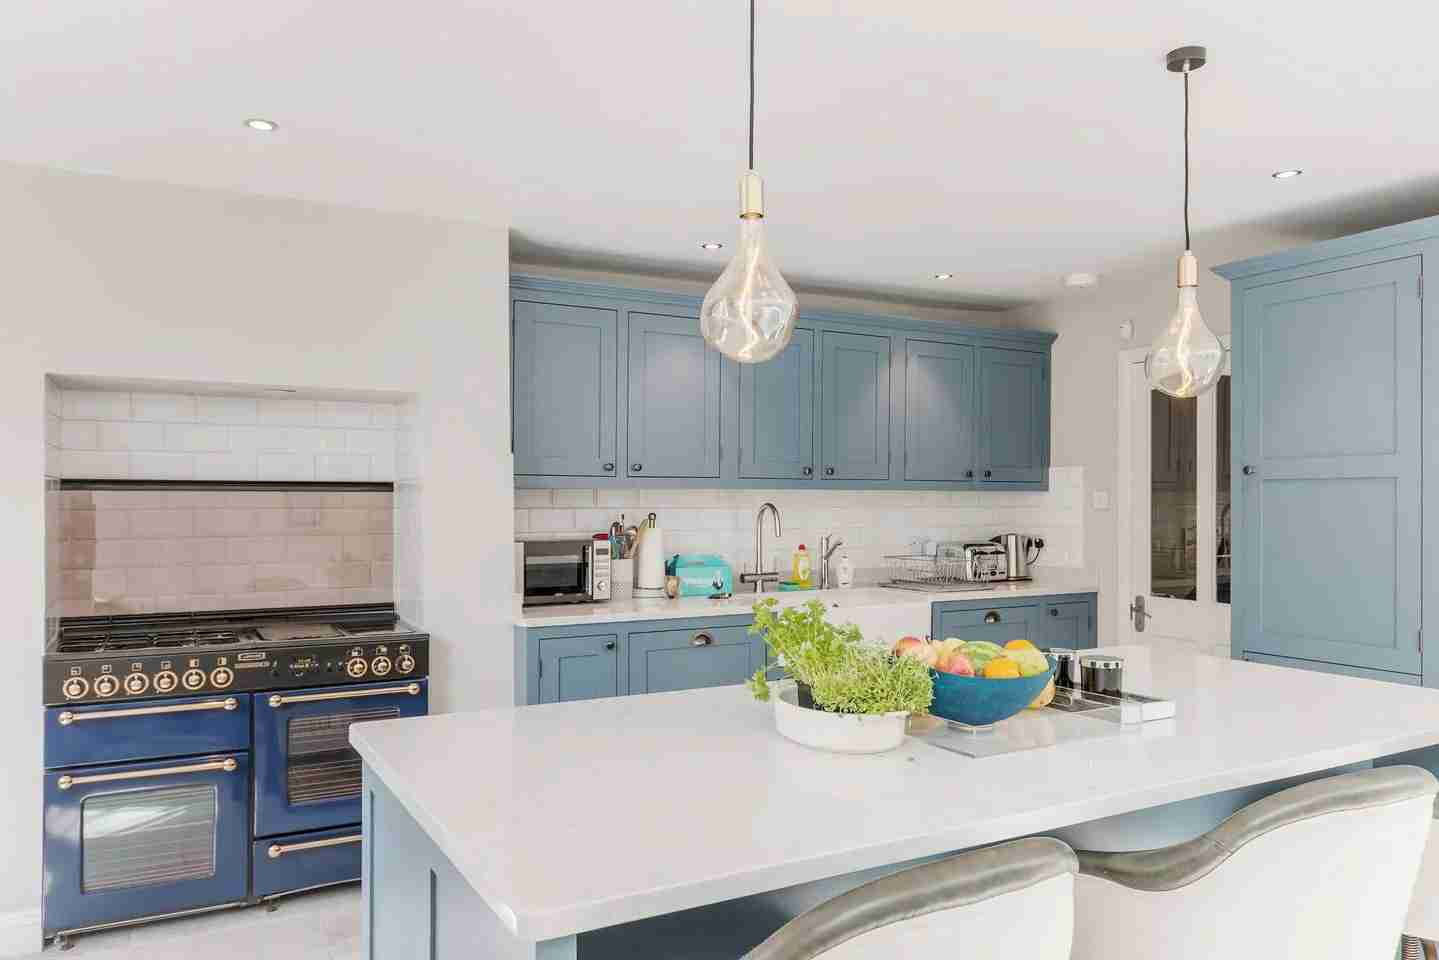 Apartment kitchen in London. (Photo courtesy of Marriott's Tribute Portfolio Homes)